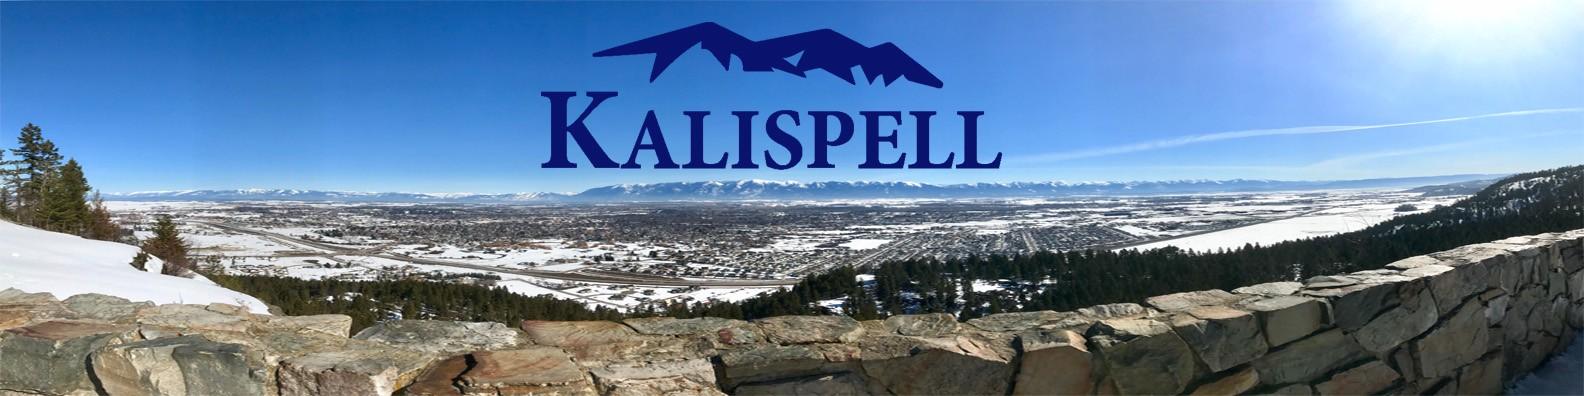 kalispell dating sites dating en arbejderklasse mand